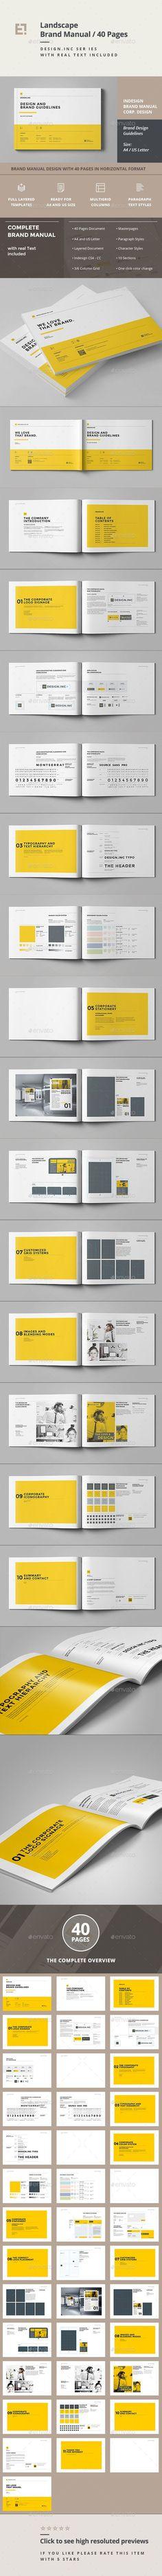 Brand Manual Template #design Download: http://graphicriver.net/item/brand-manual/11805697?ref=ksioks #MANUALDESIGN